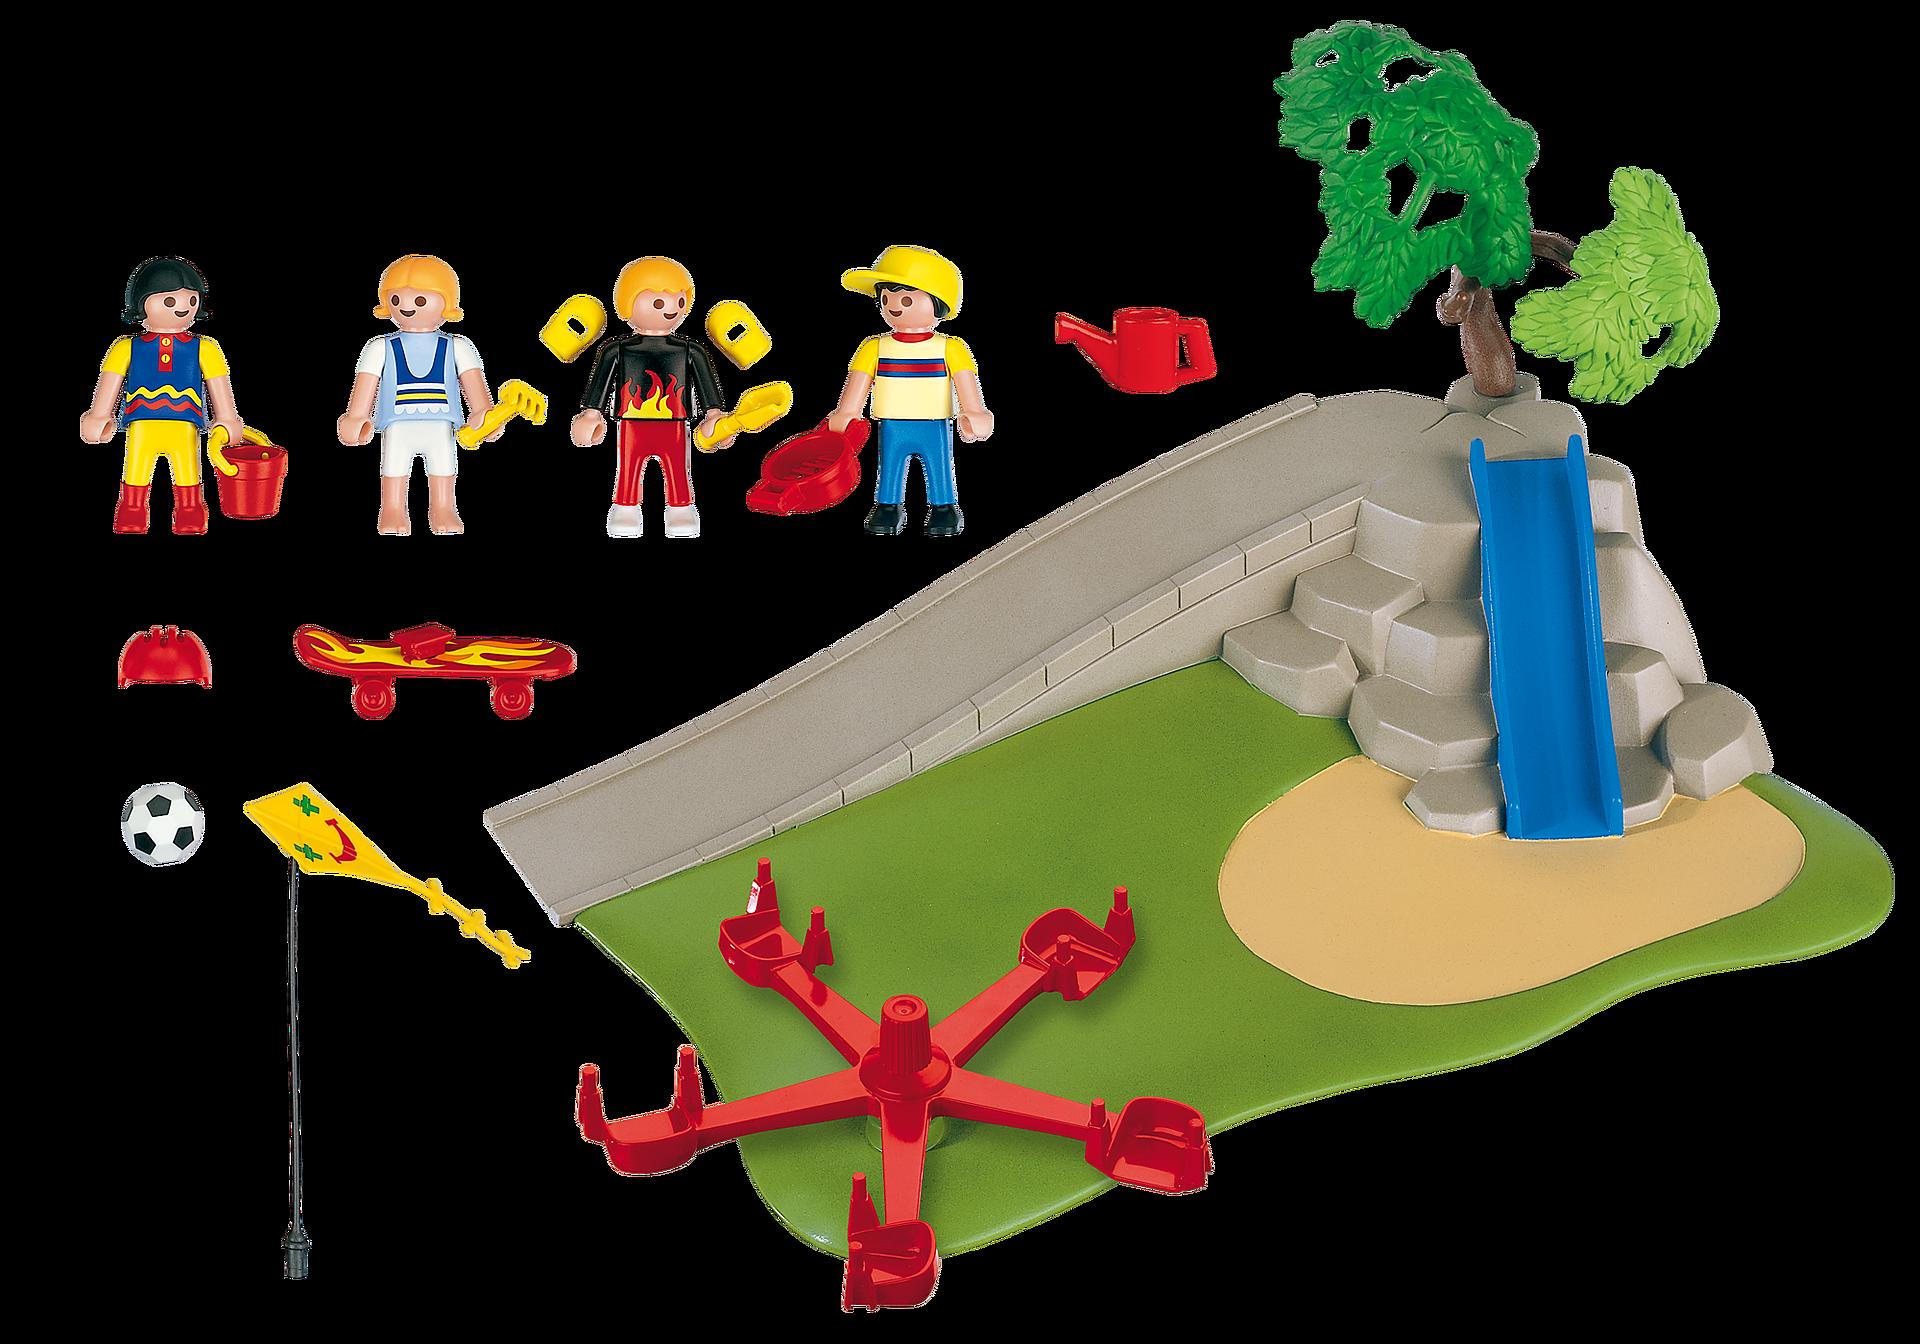 4132 Jardin pour enfants Superset zoom image3